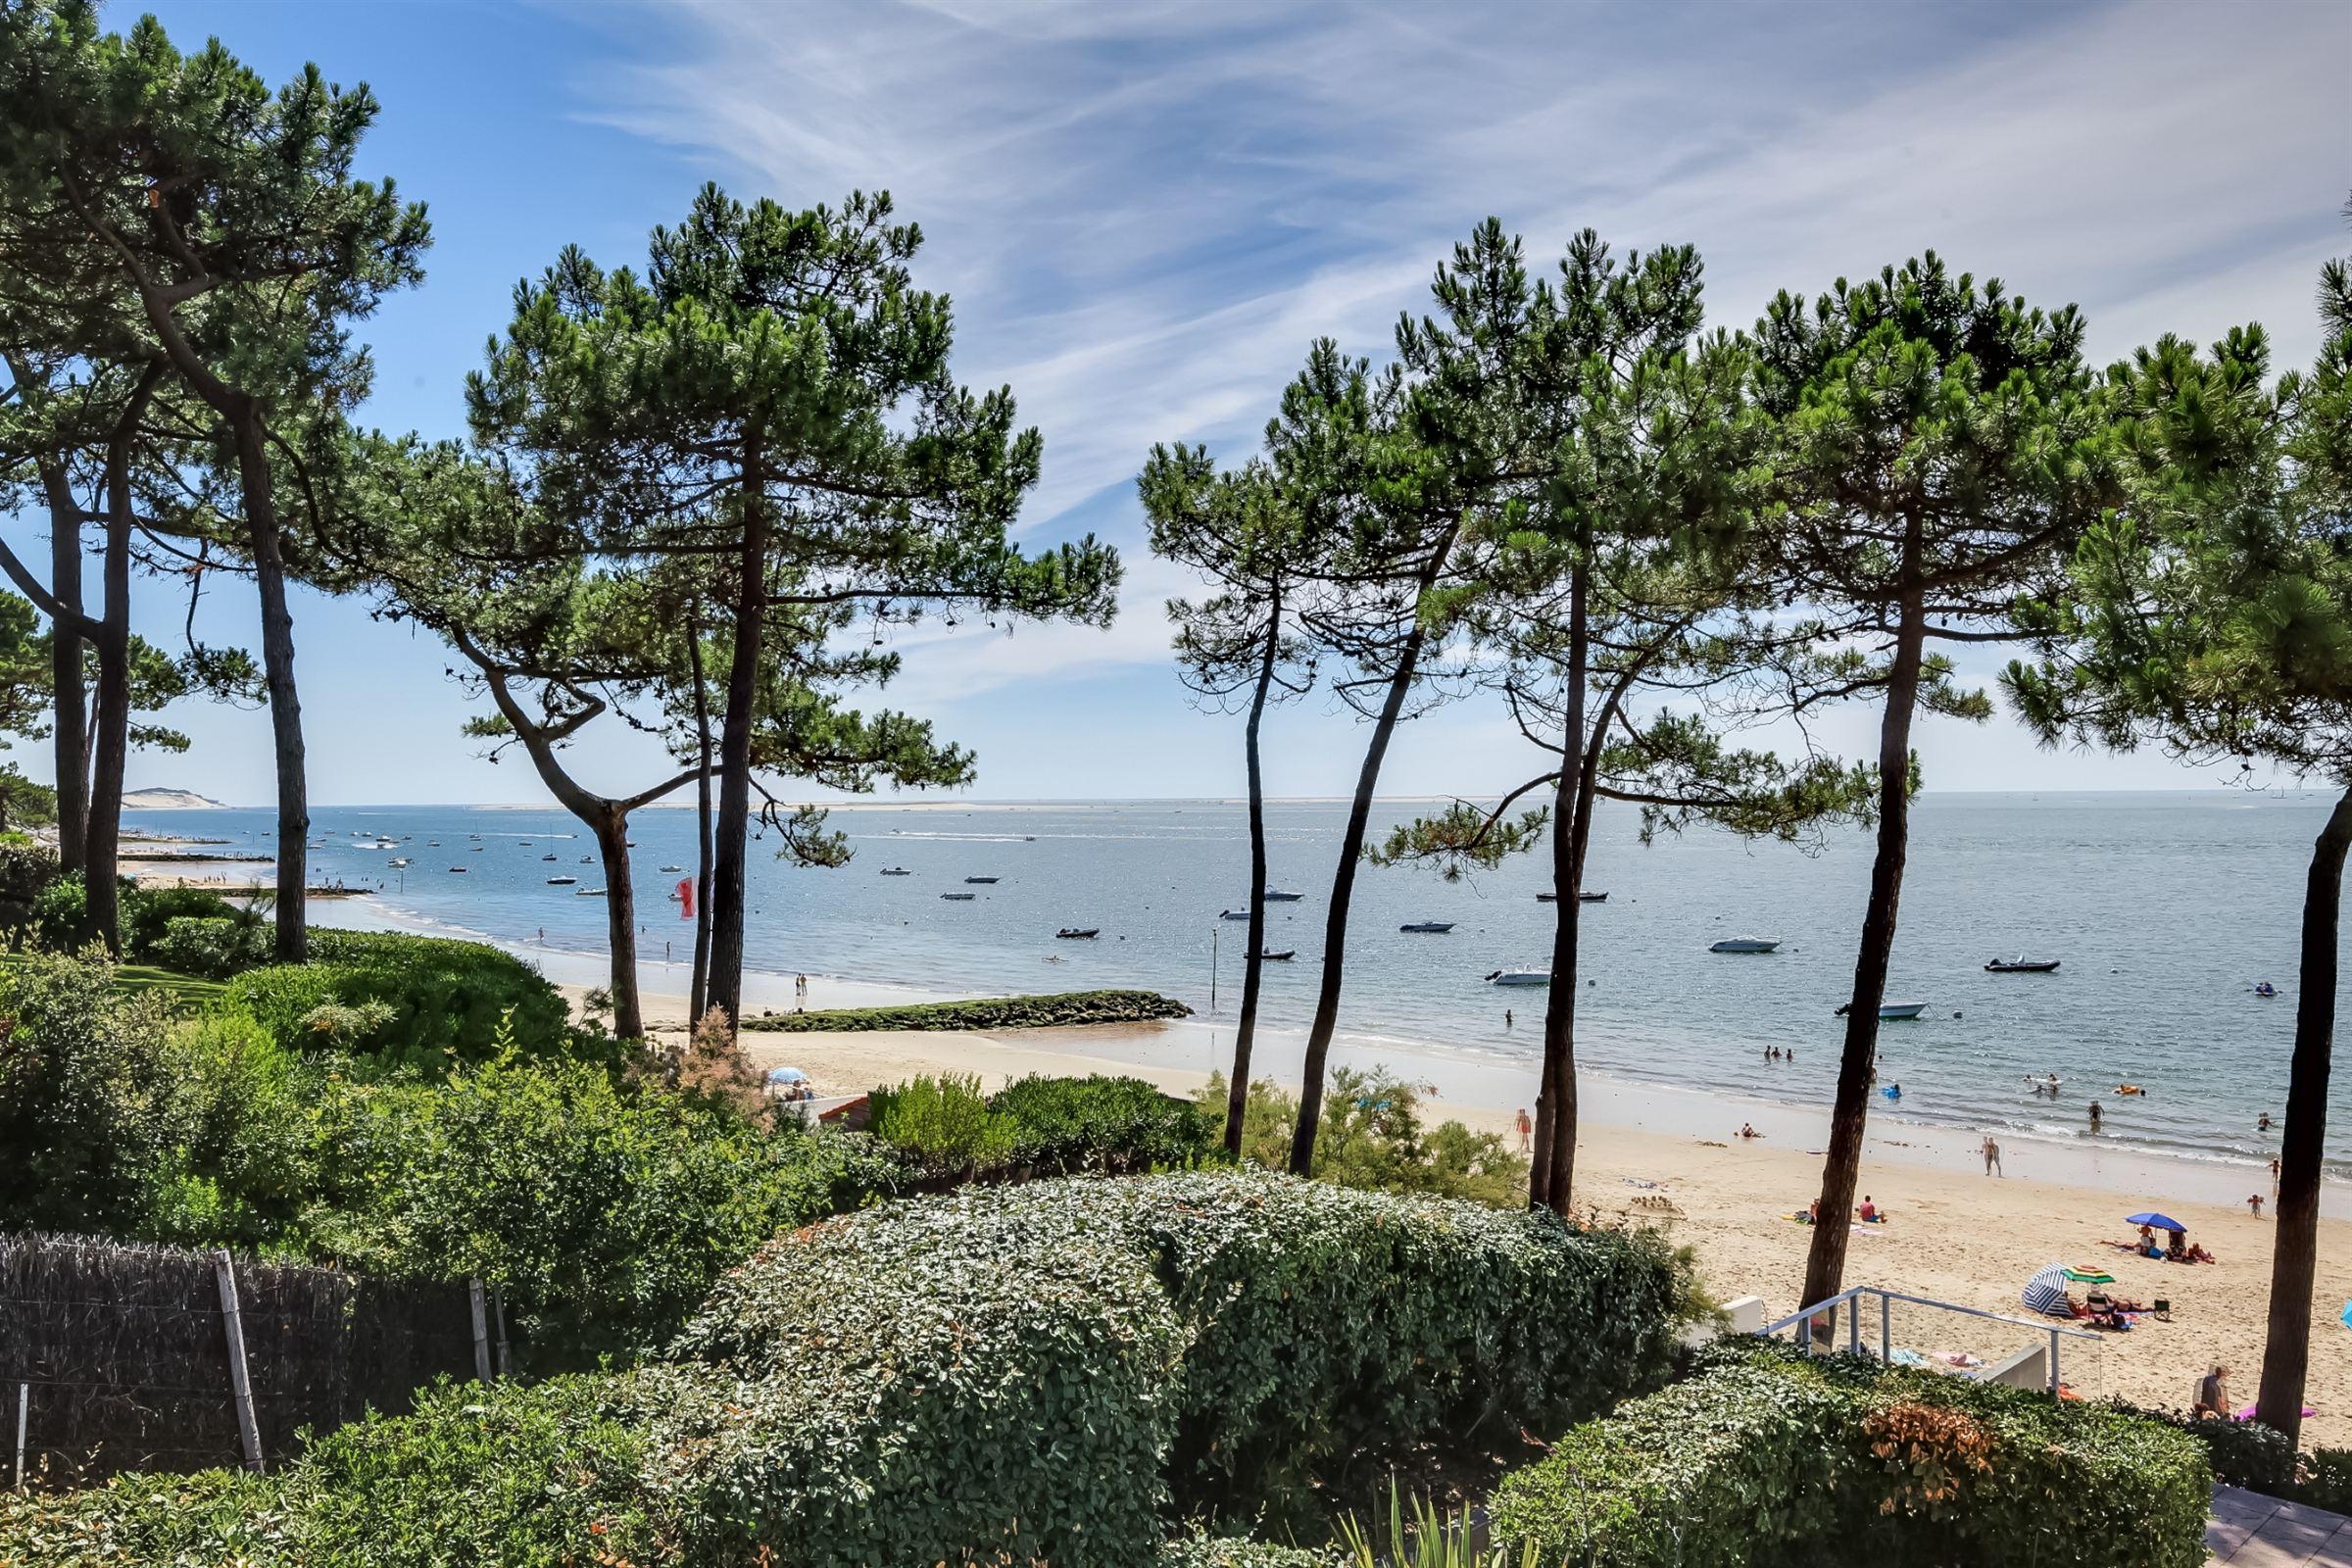 Villa per Vendita alle ore PYLA SUR MER - FRONT LINE CONTEMPORARY SUMMER VILLA Pyla Sur Mer, Aquitania, 33115 Francia